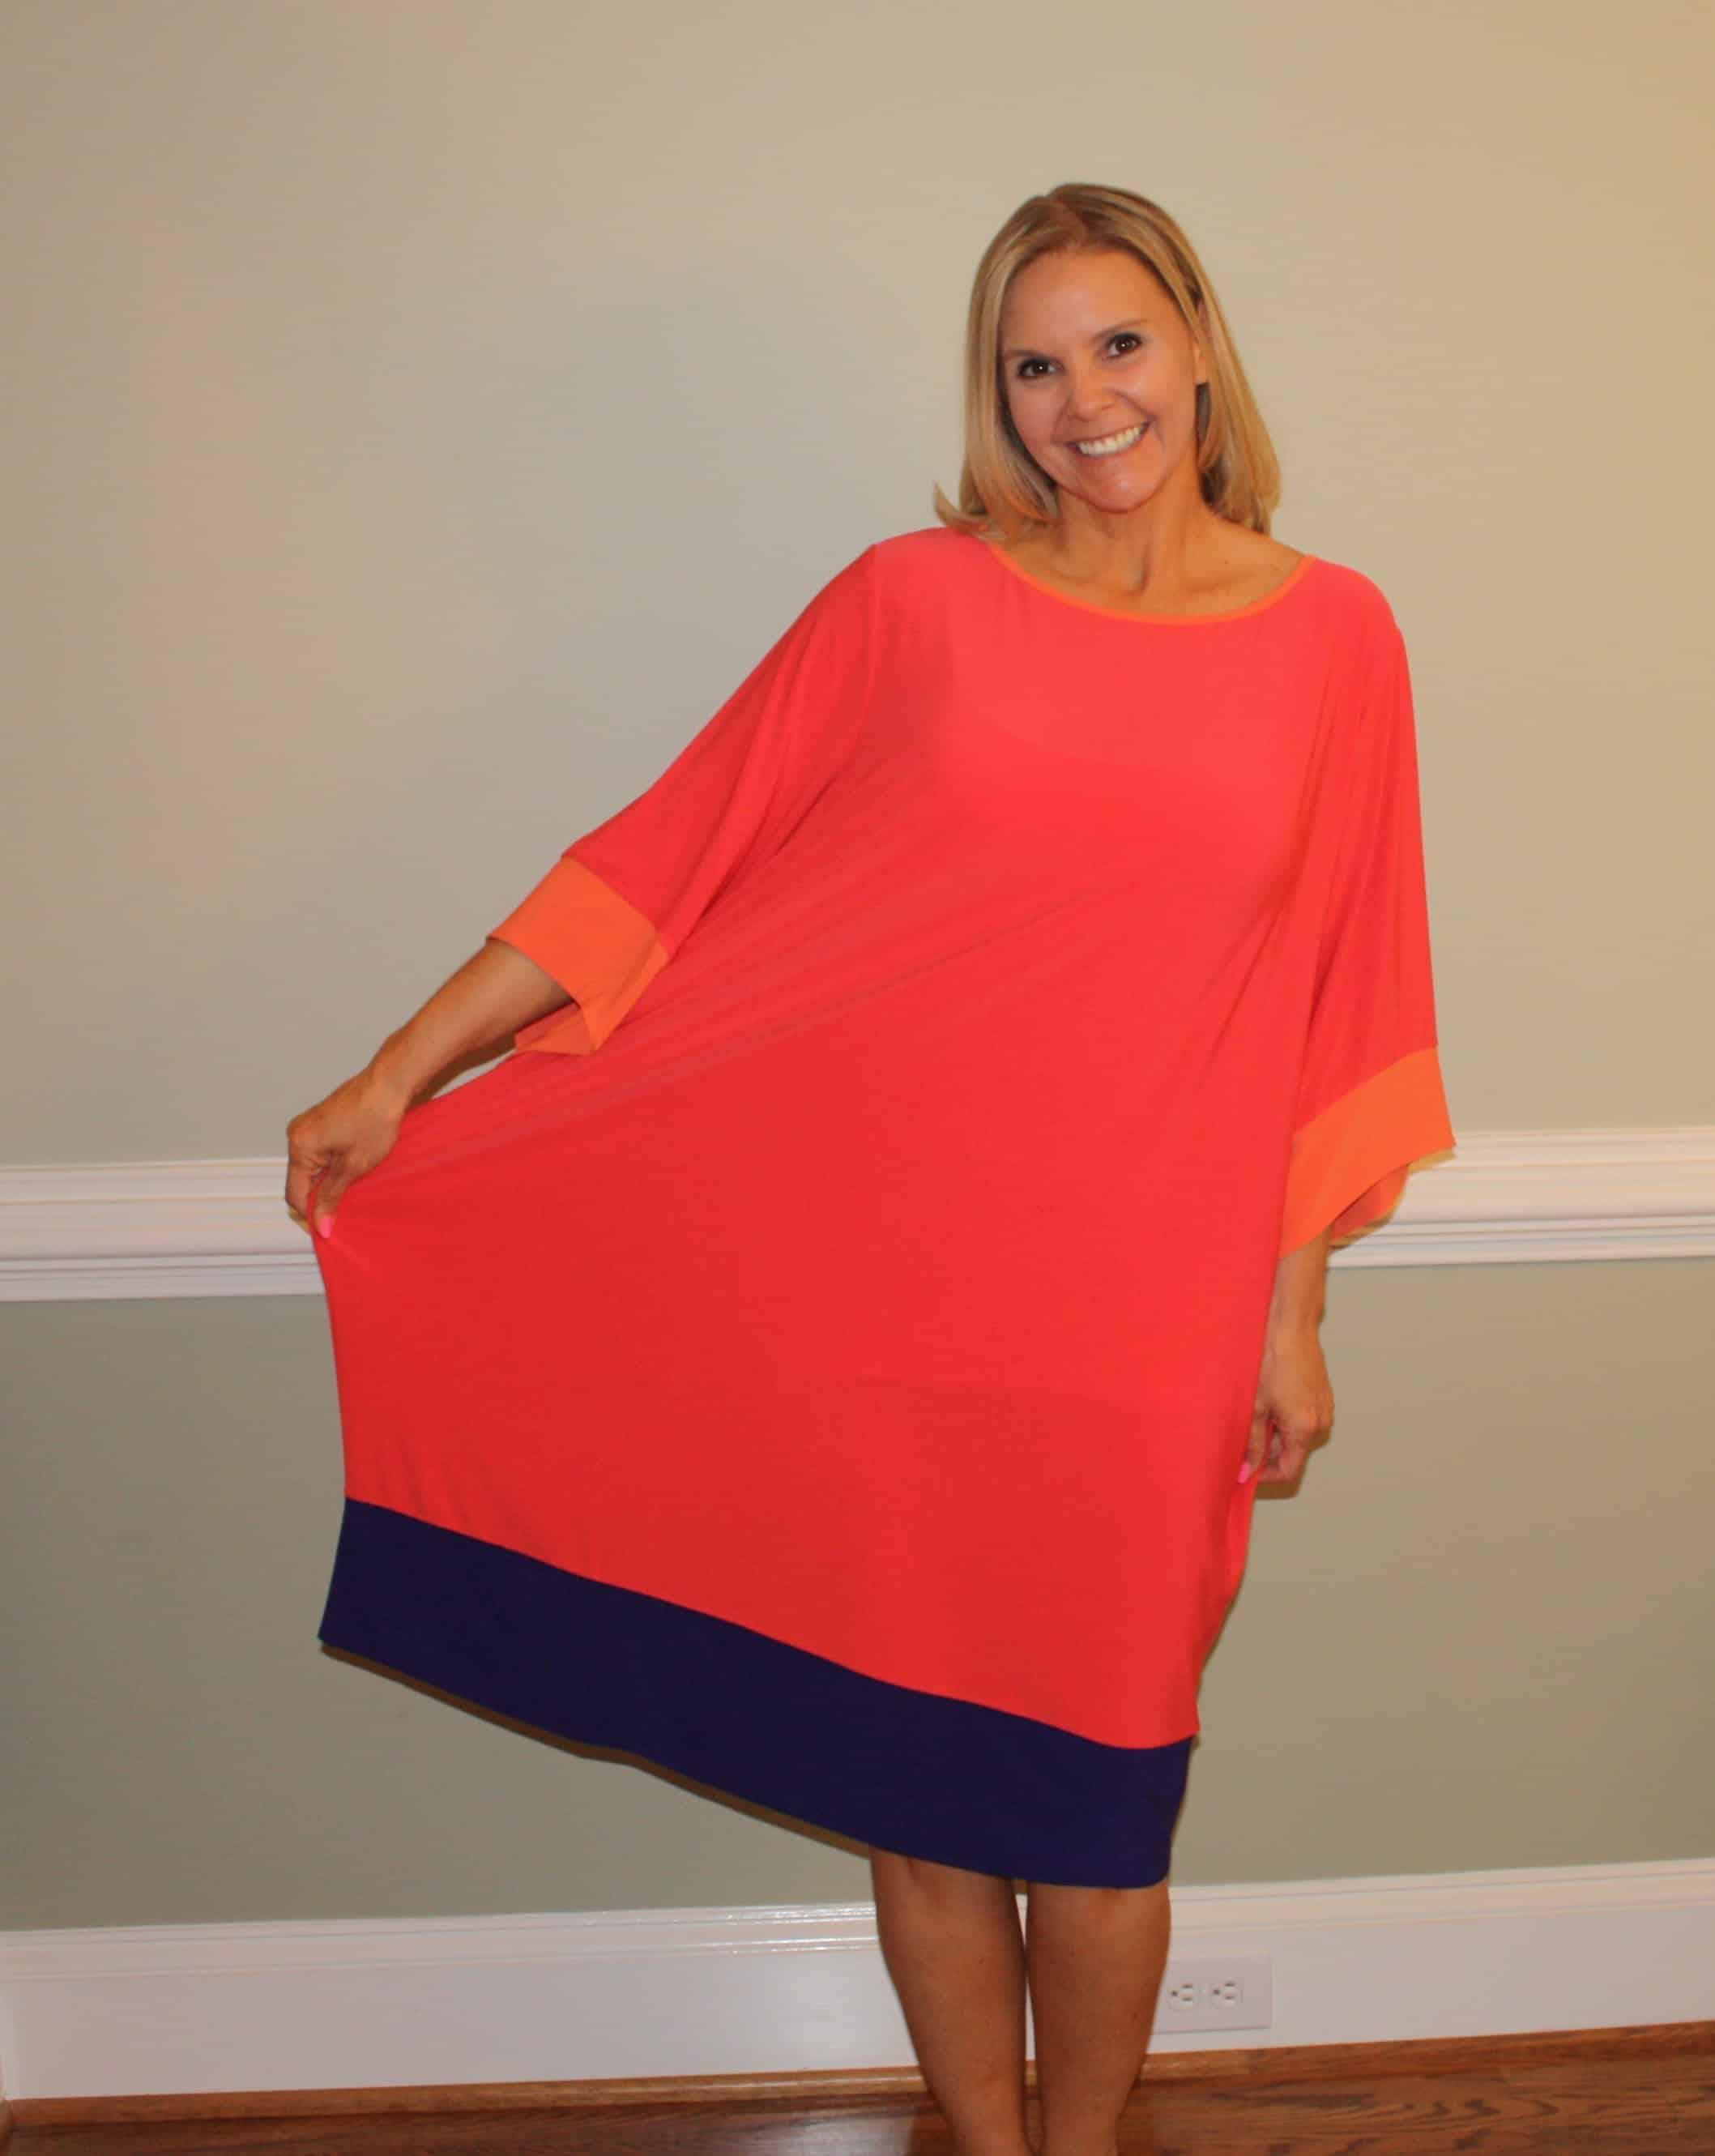 Baggy dress refitting